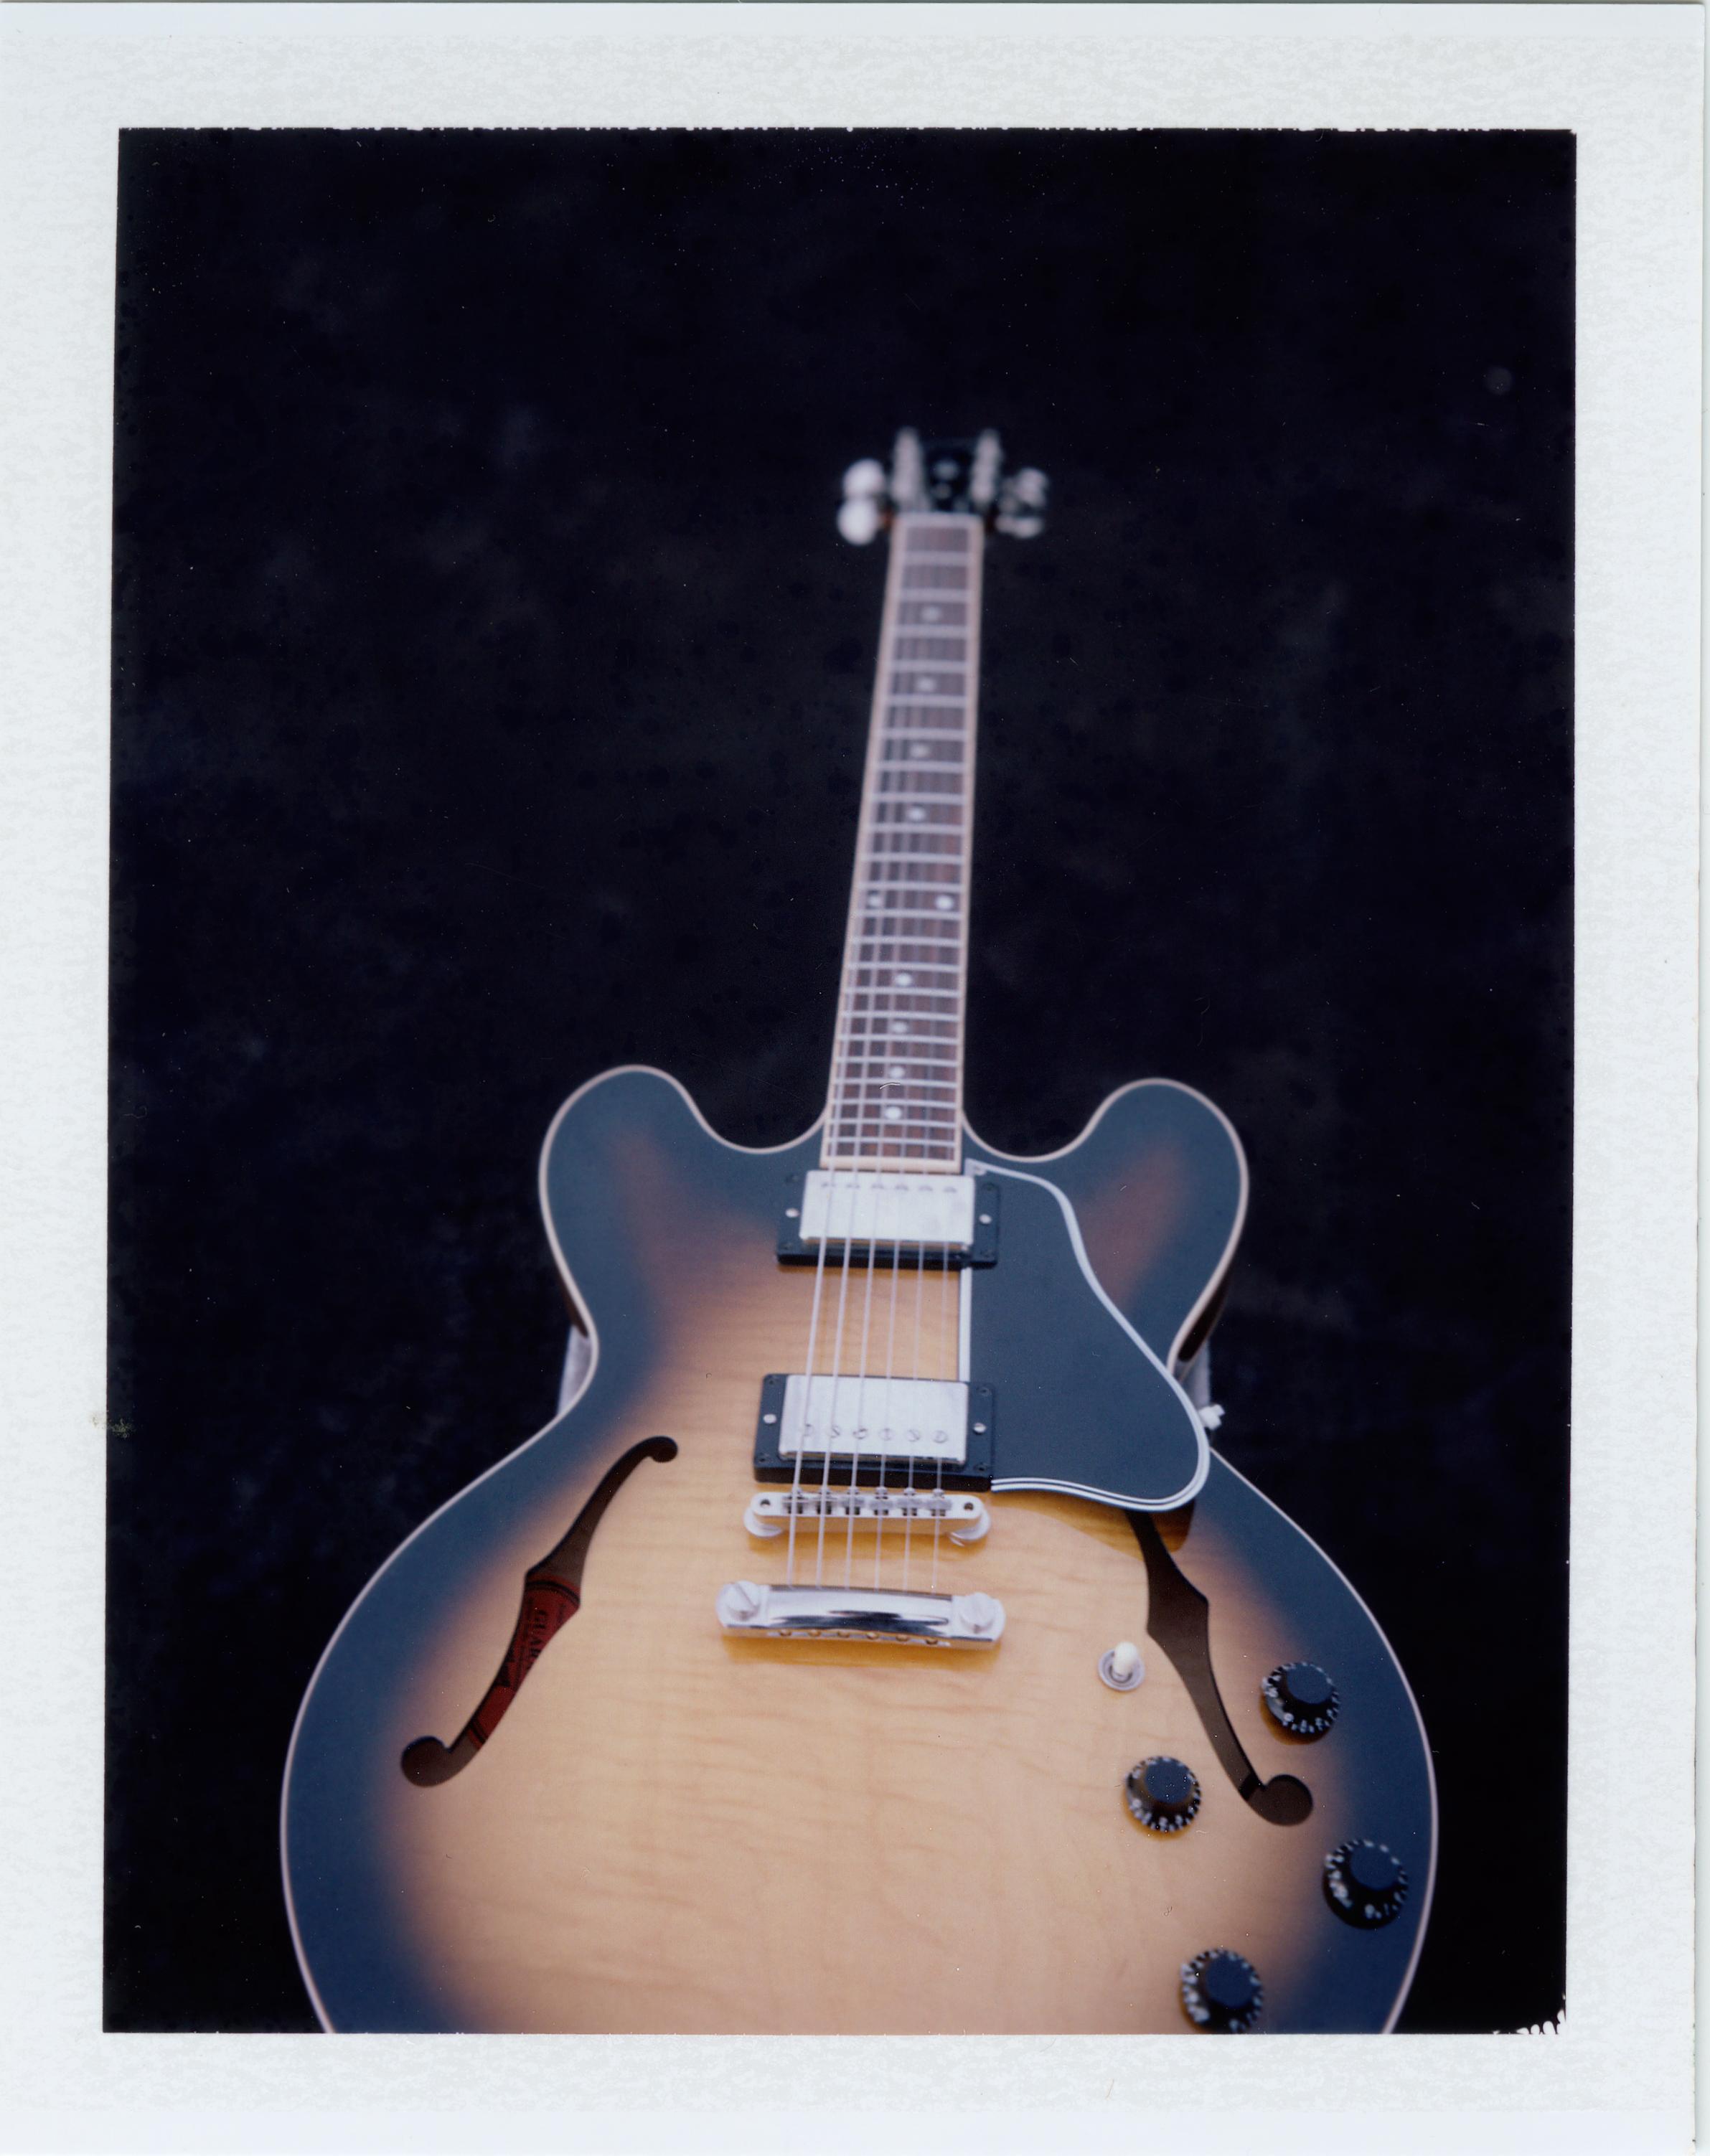 Steve Cal 2013-10-08 Fuji Instant Film 15.jpg